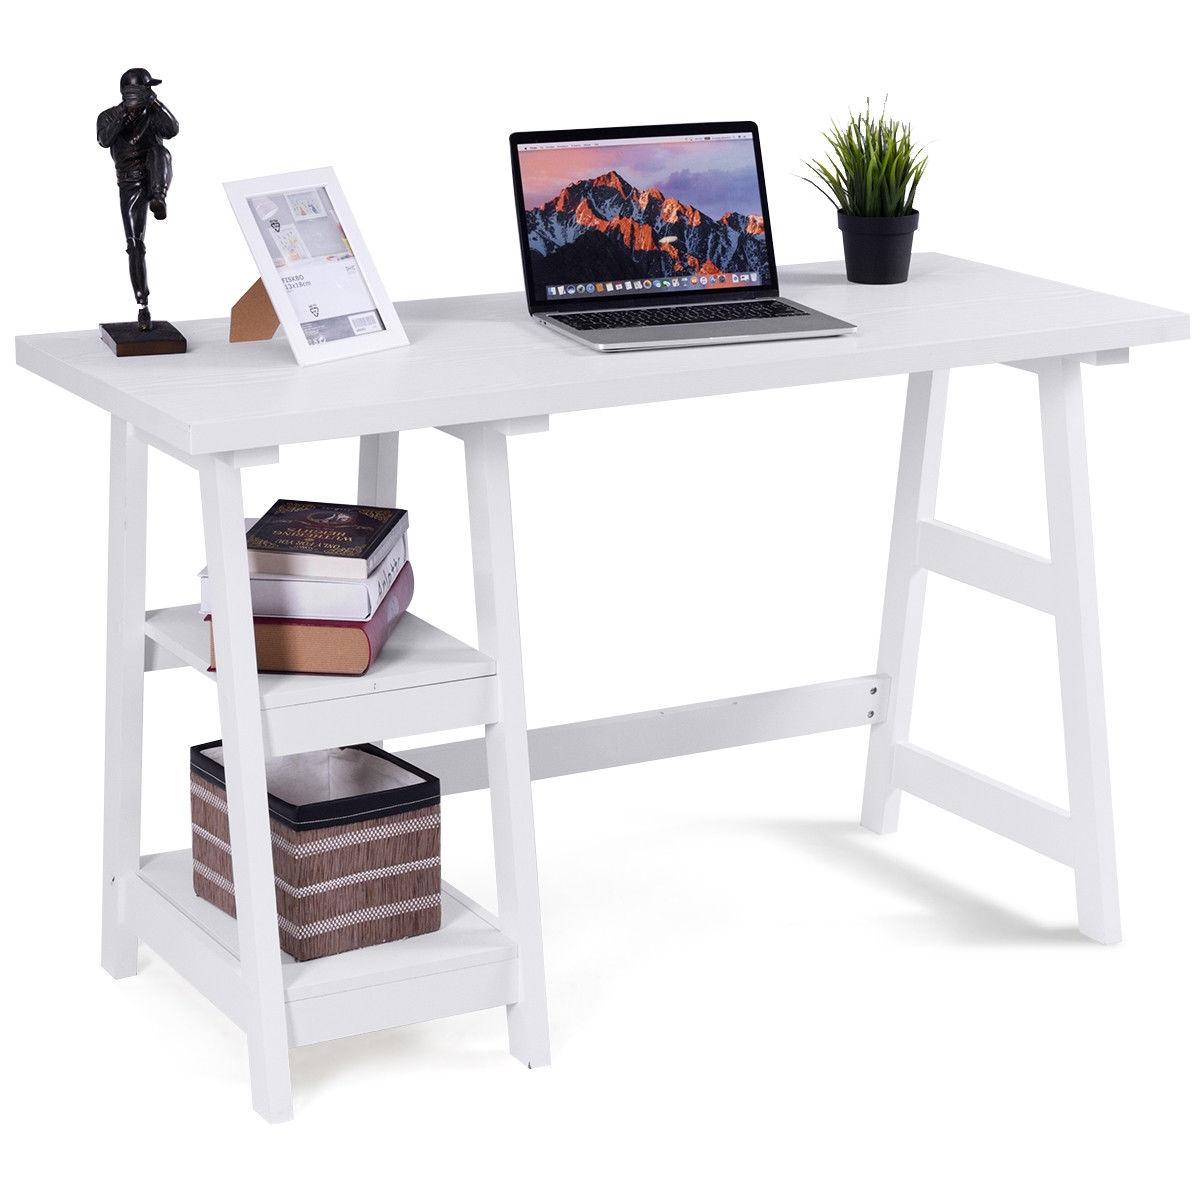 Modern Trestle Computer Desk Writing Laptop Table W/2 Open Tiers Shelves White-White